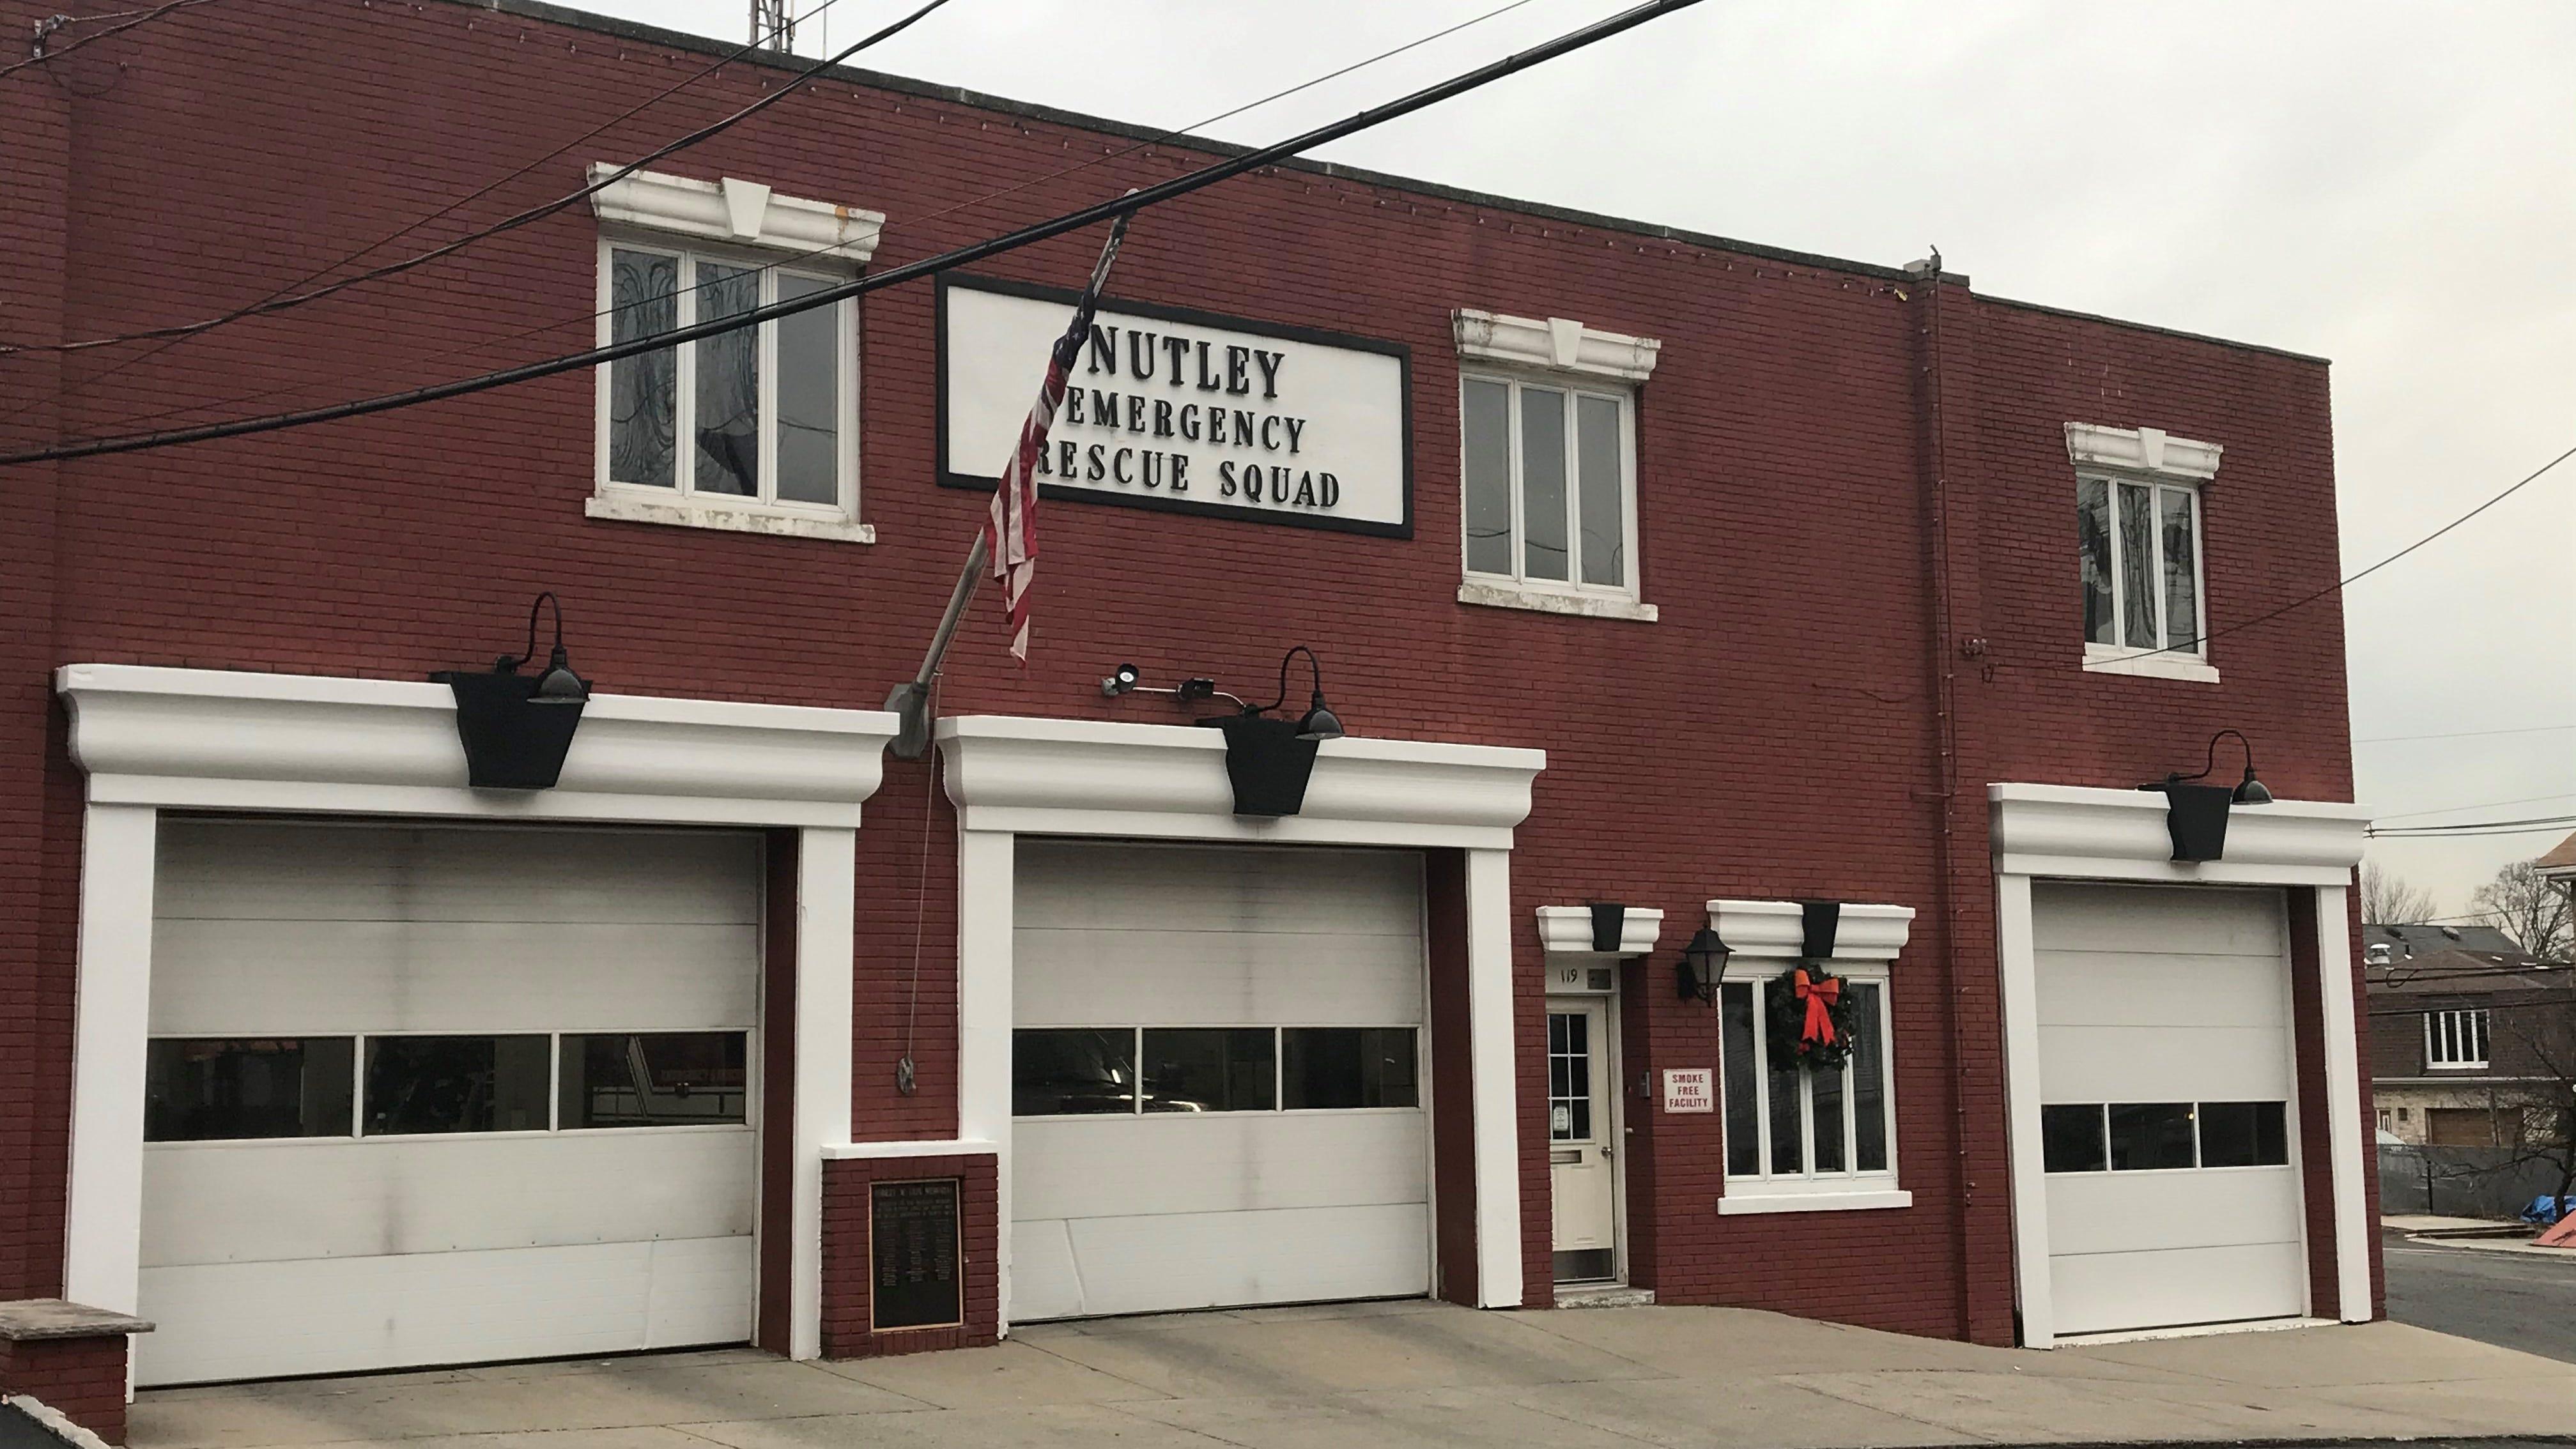 Nutley NJ ambulance squad disbanded following squad president arrest